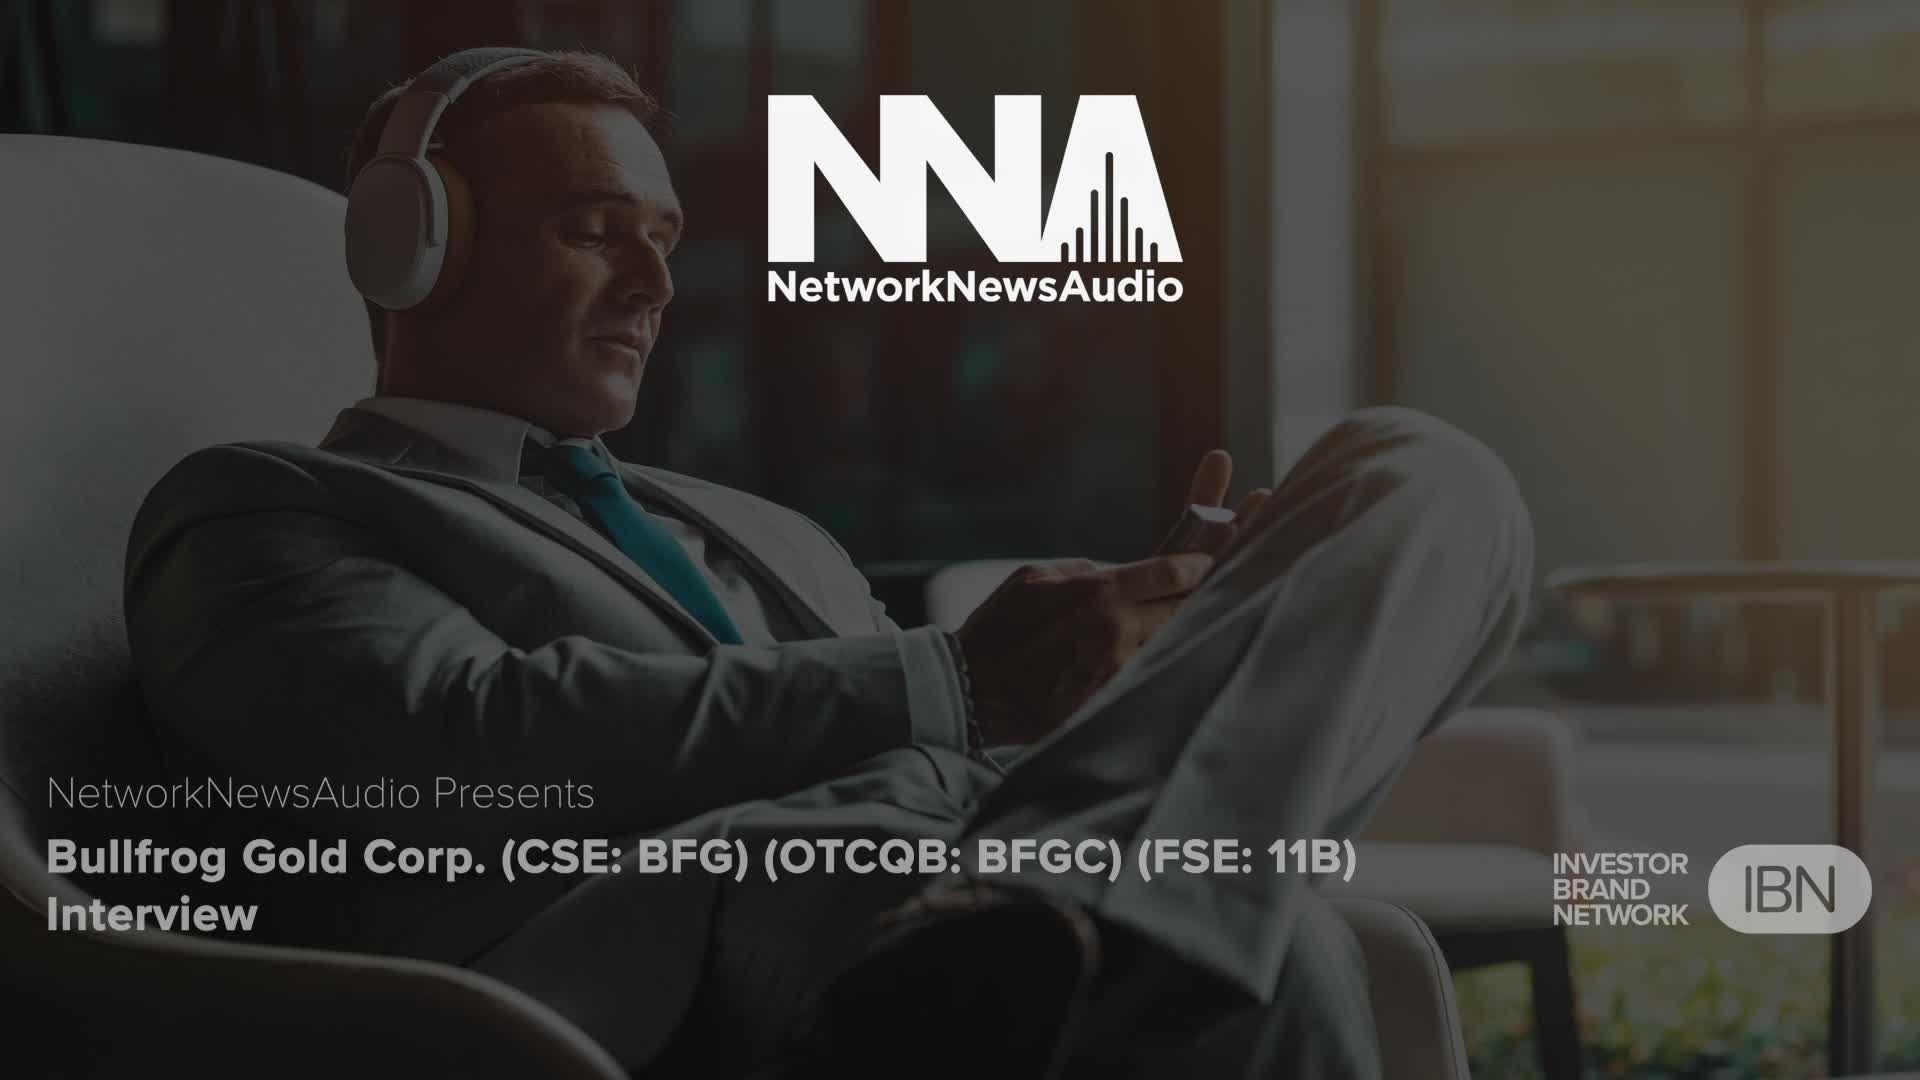 Bullfrog Gold Corp. (CSE: BFG) (OTCQB: BFGC) (FSE: 11B) Interview